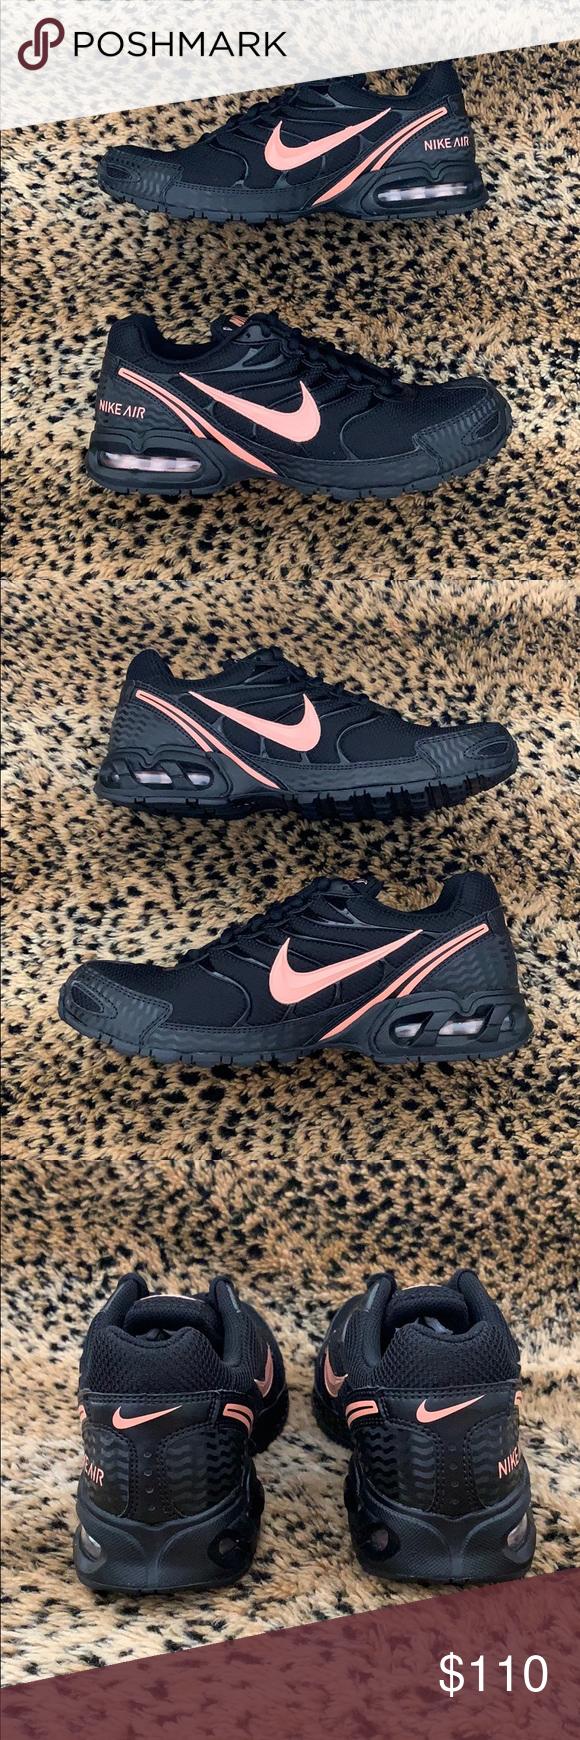 Nike Air Max Torch 4 Running Shoe Black